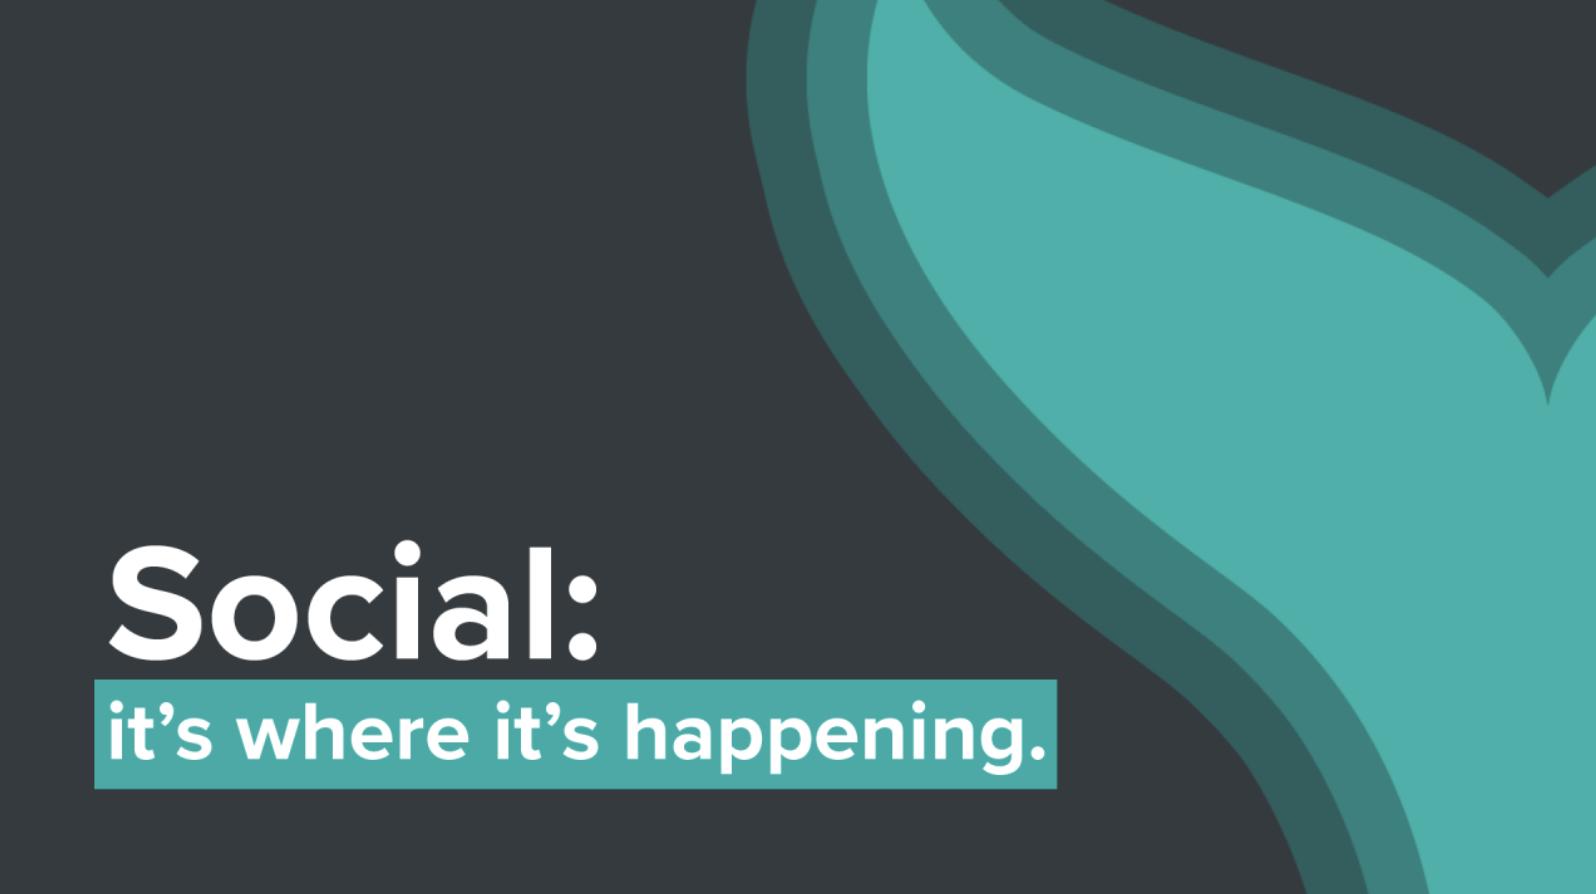 Social: it's where it's happening.